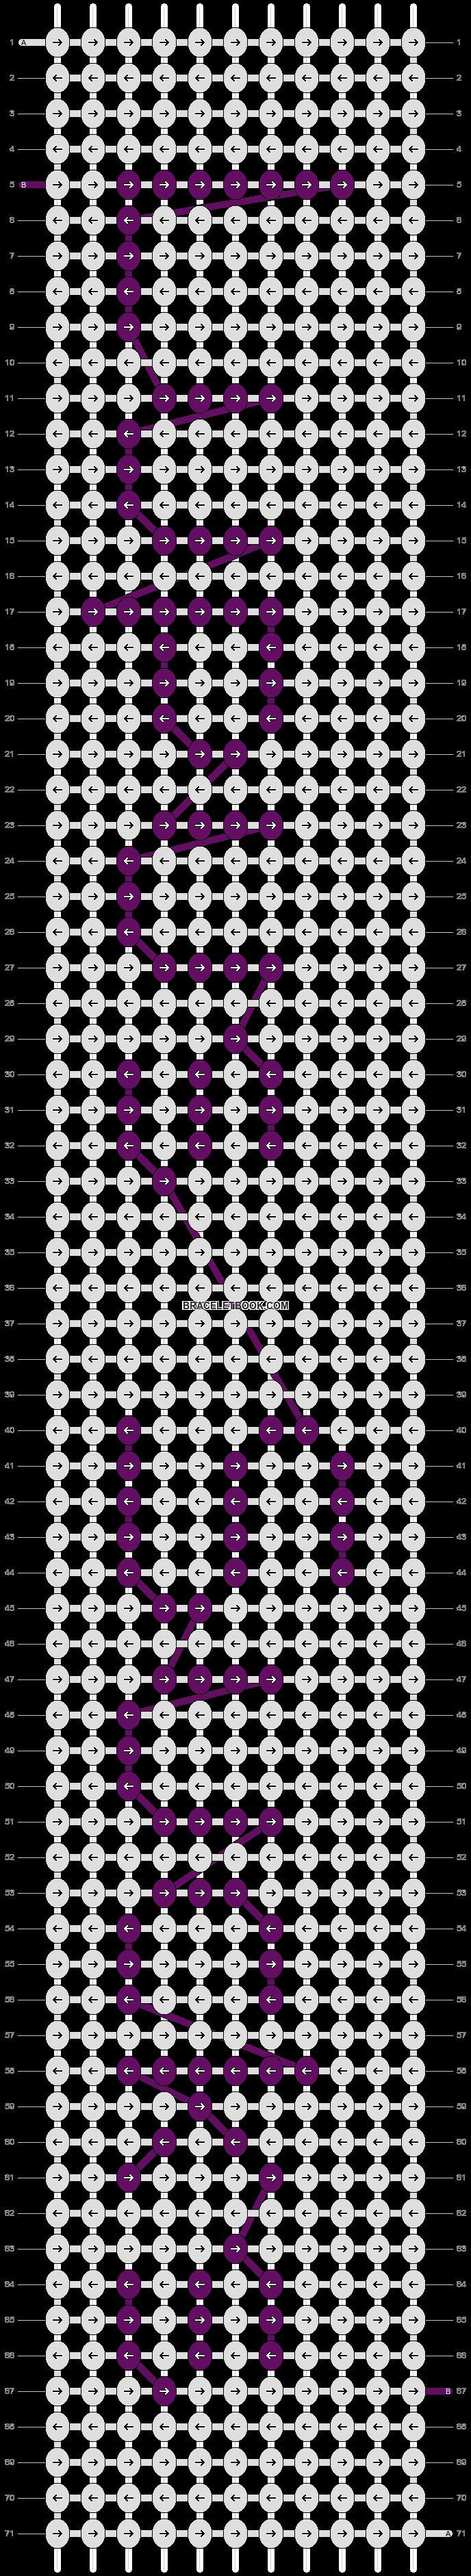 Alpha pattern #3454 pattern